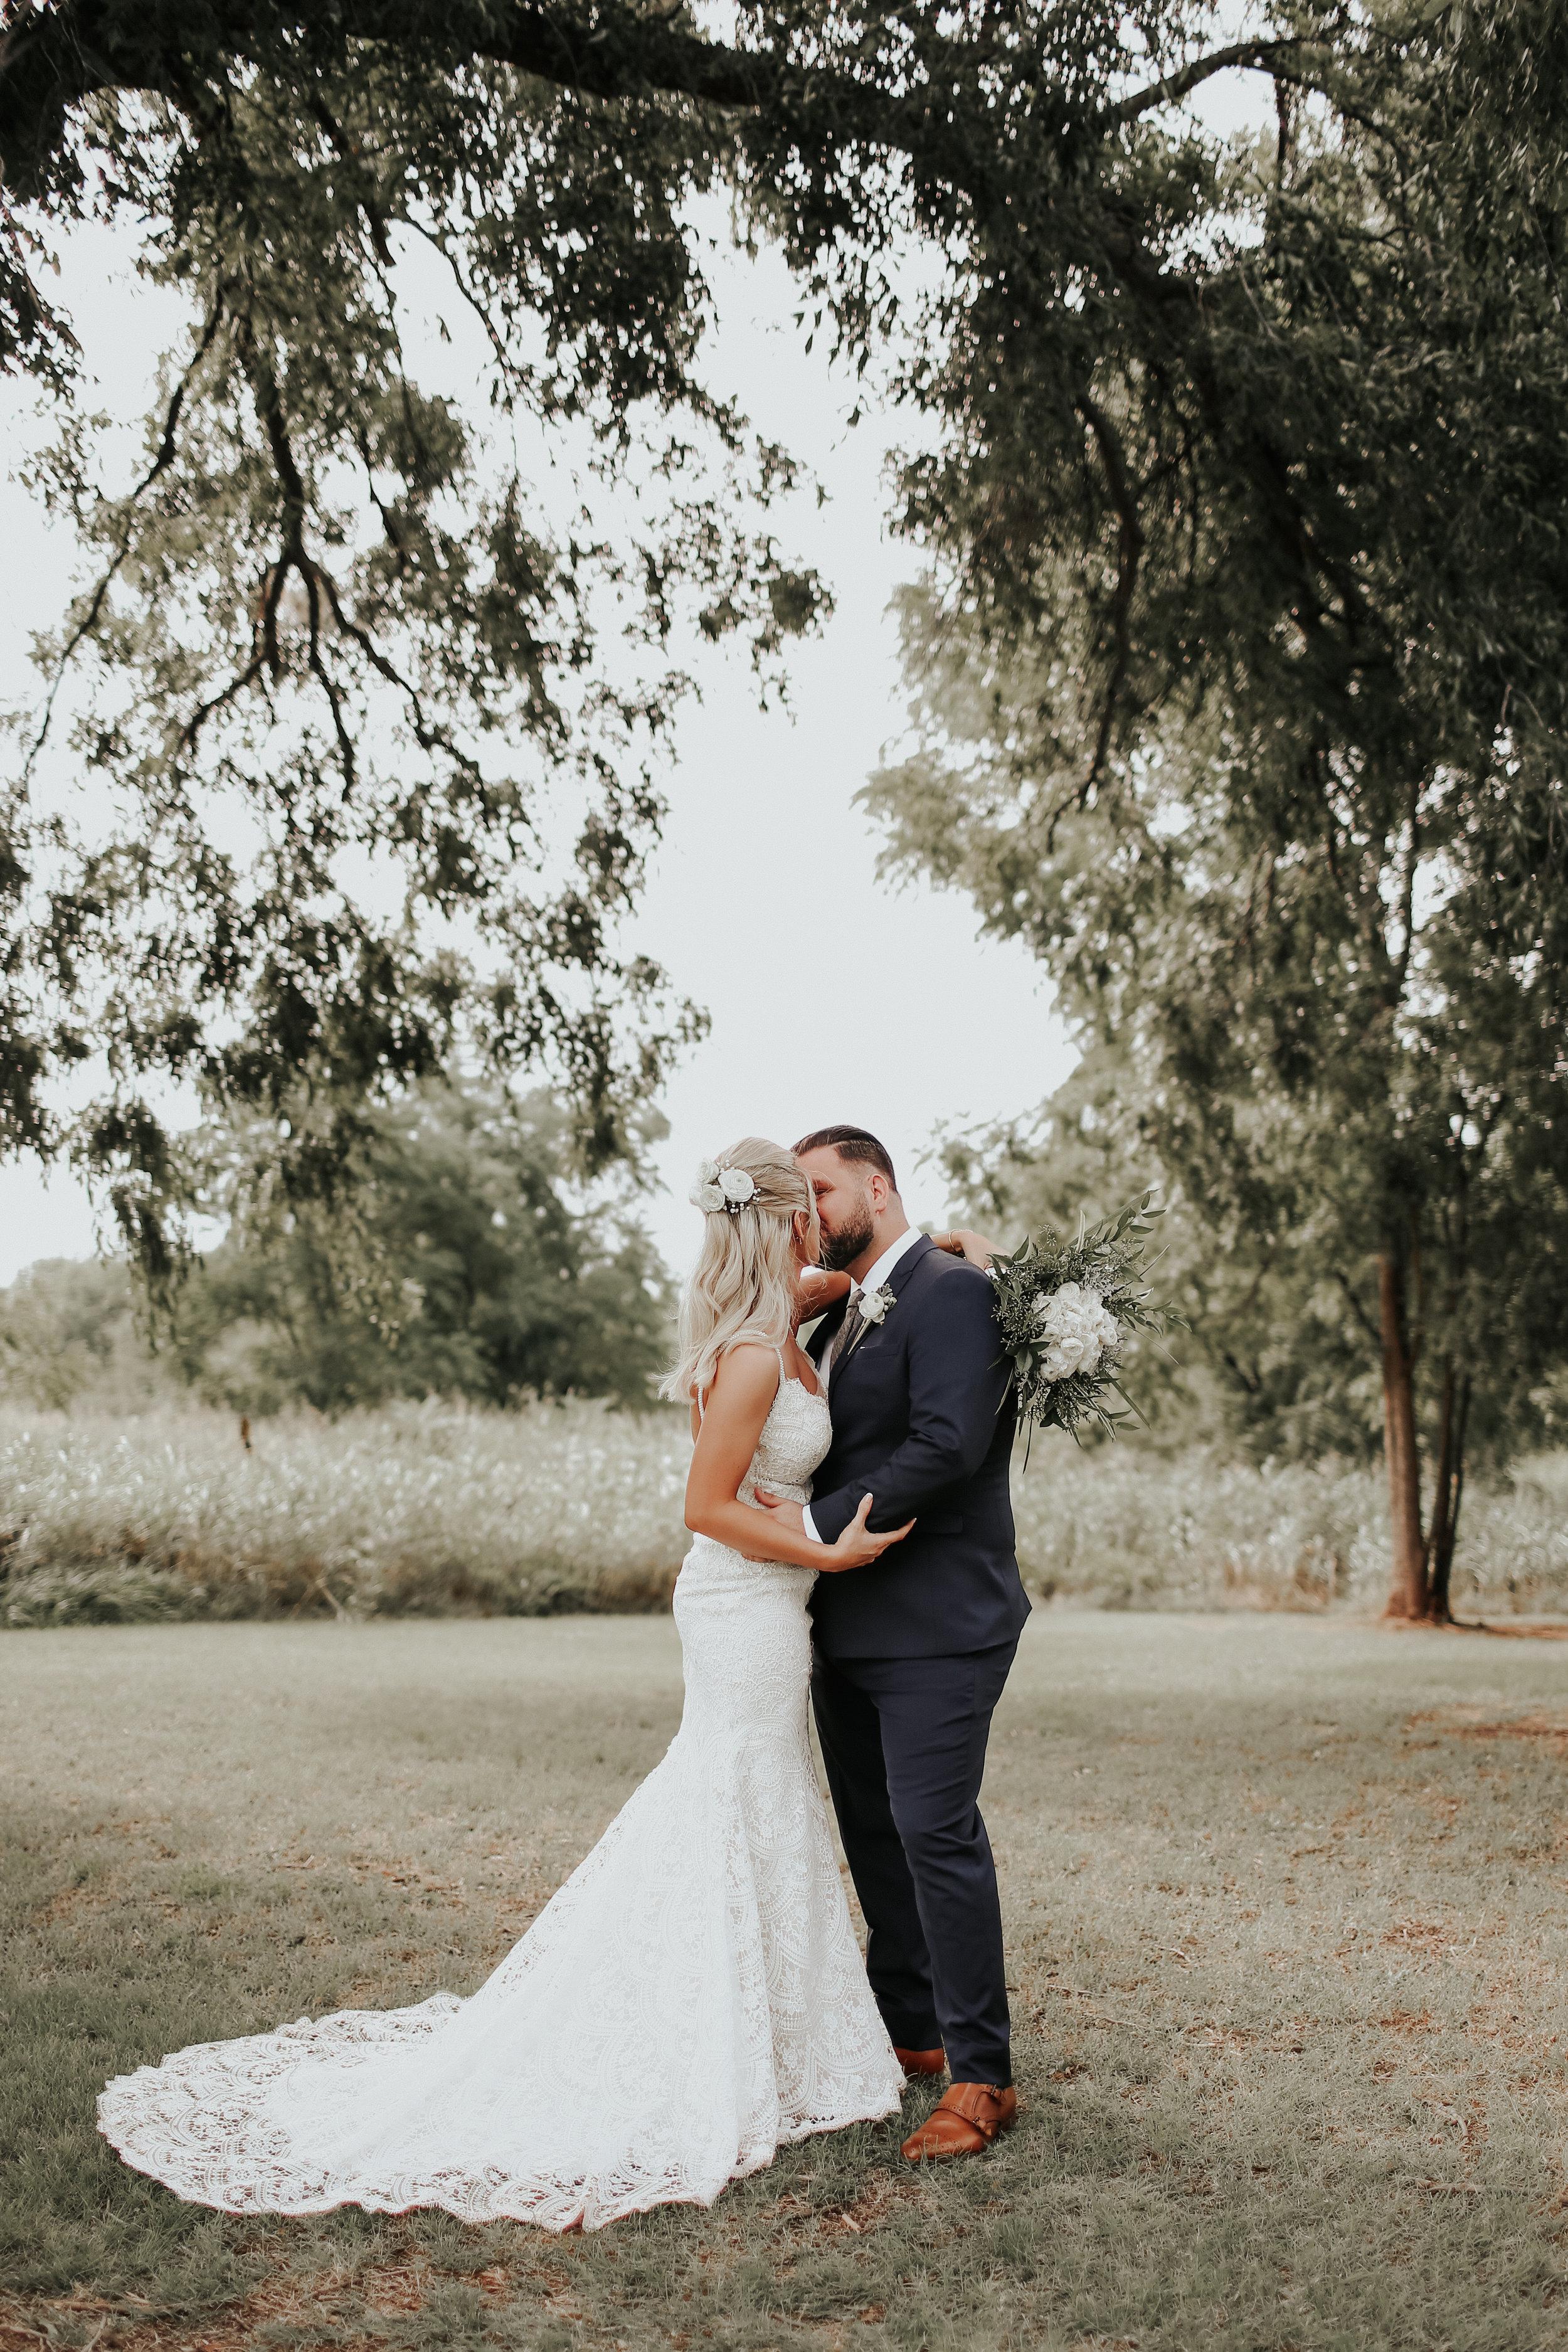 Backyard_Wedding_Oklahoma_MelissaMarshall_16.jpg